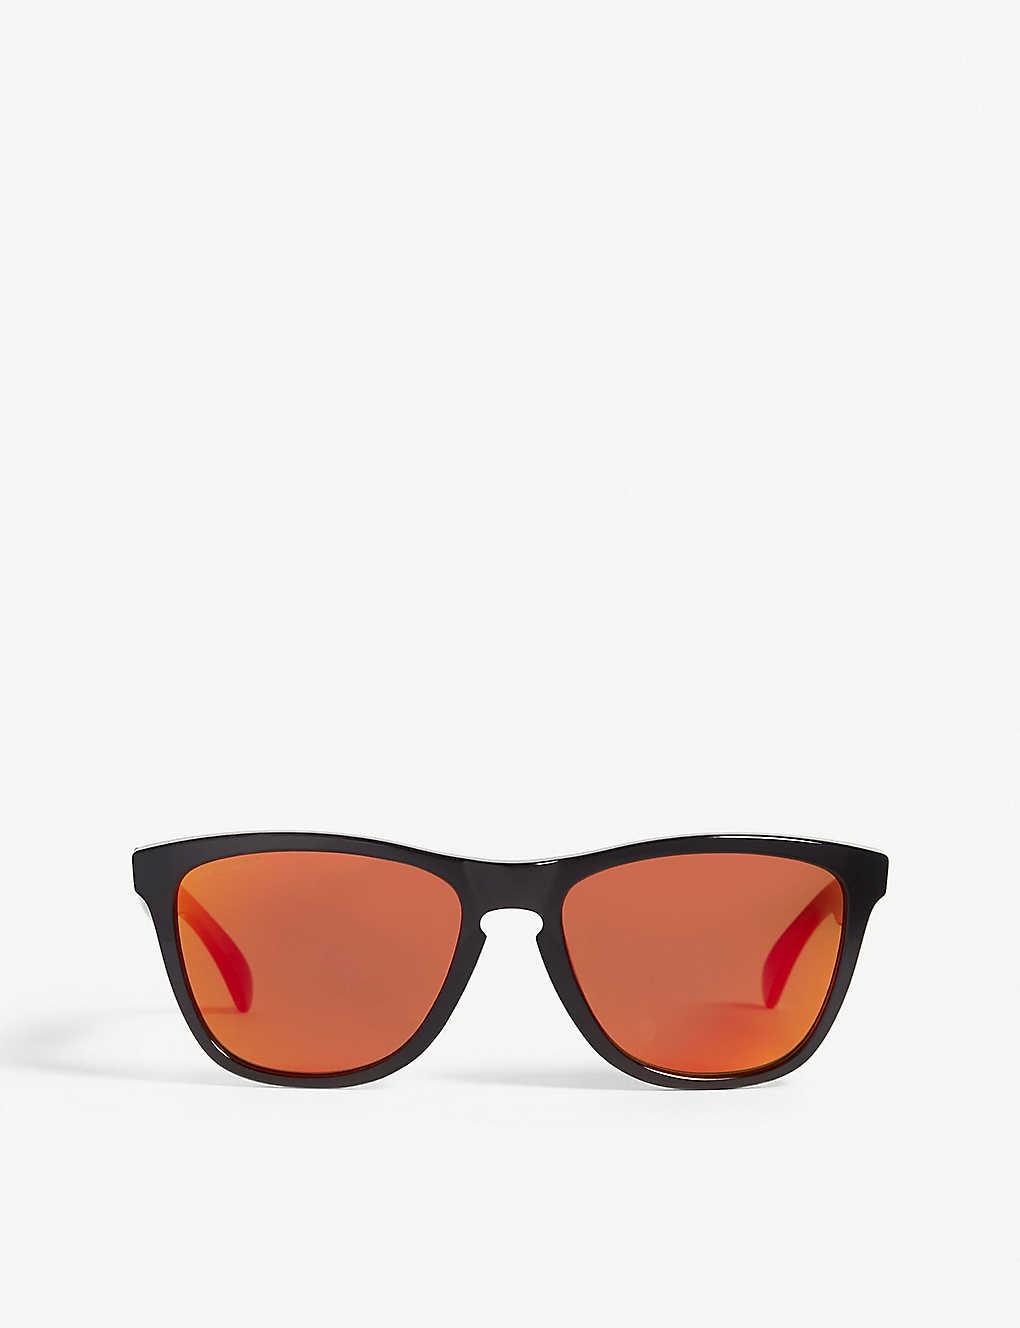 a5d97b74a8d OAKLEY - Frogskins O-Matter square sunglasses